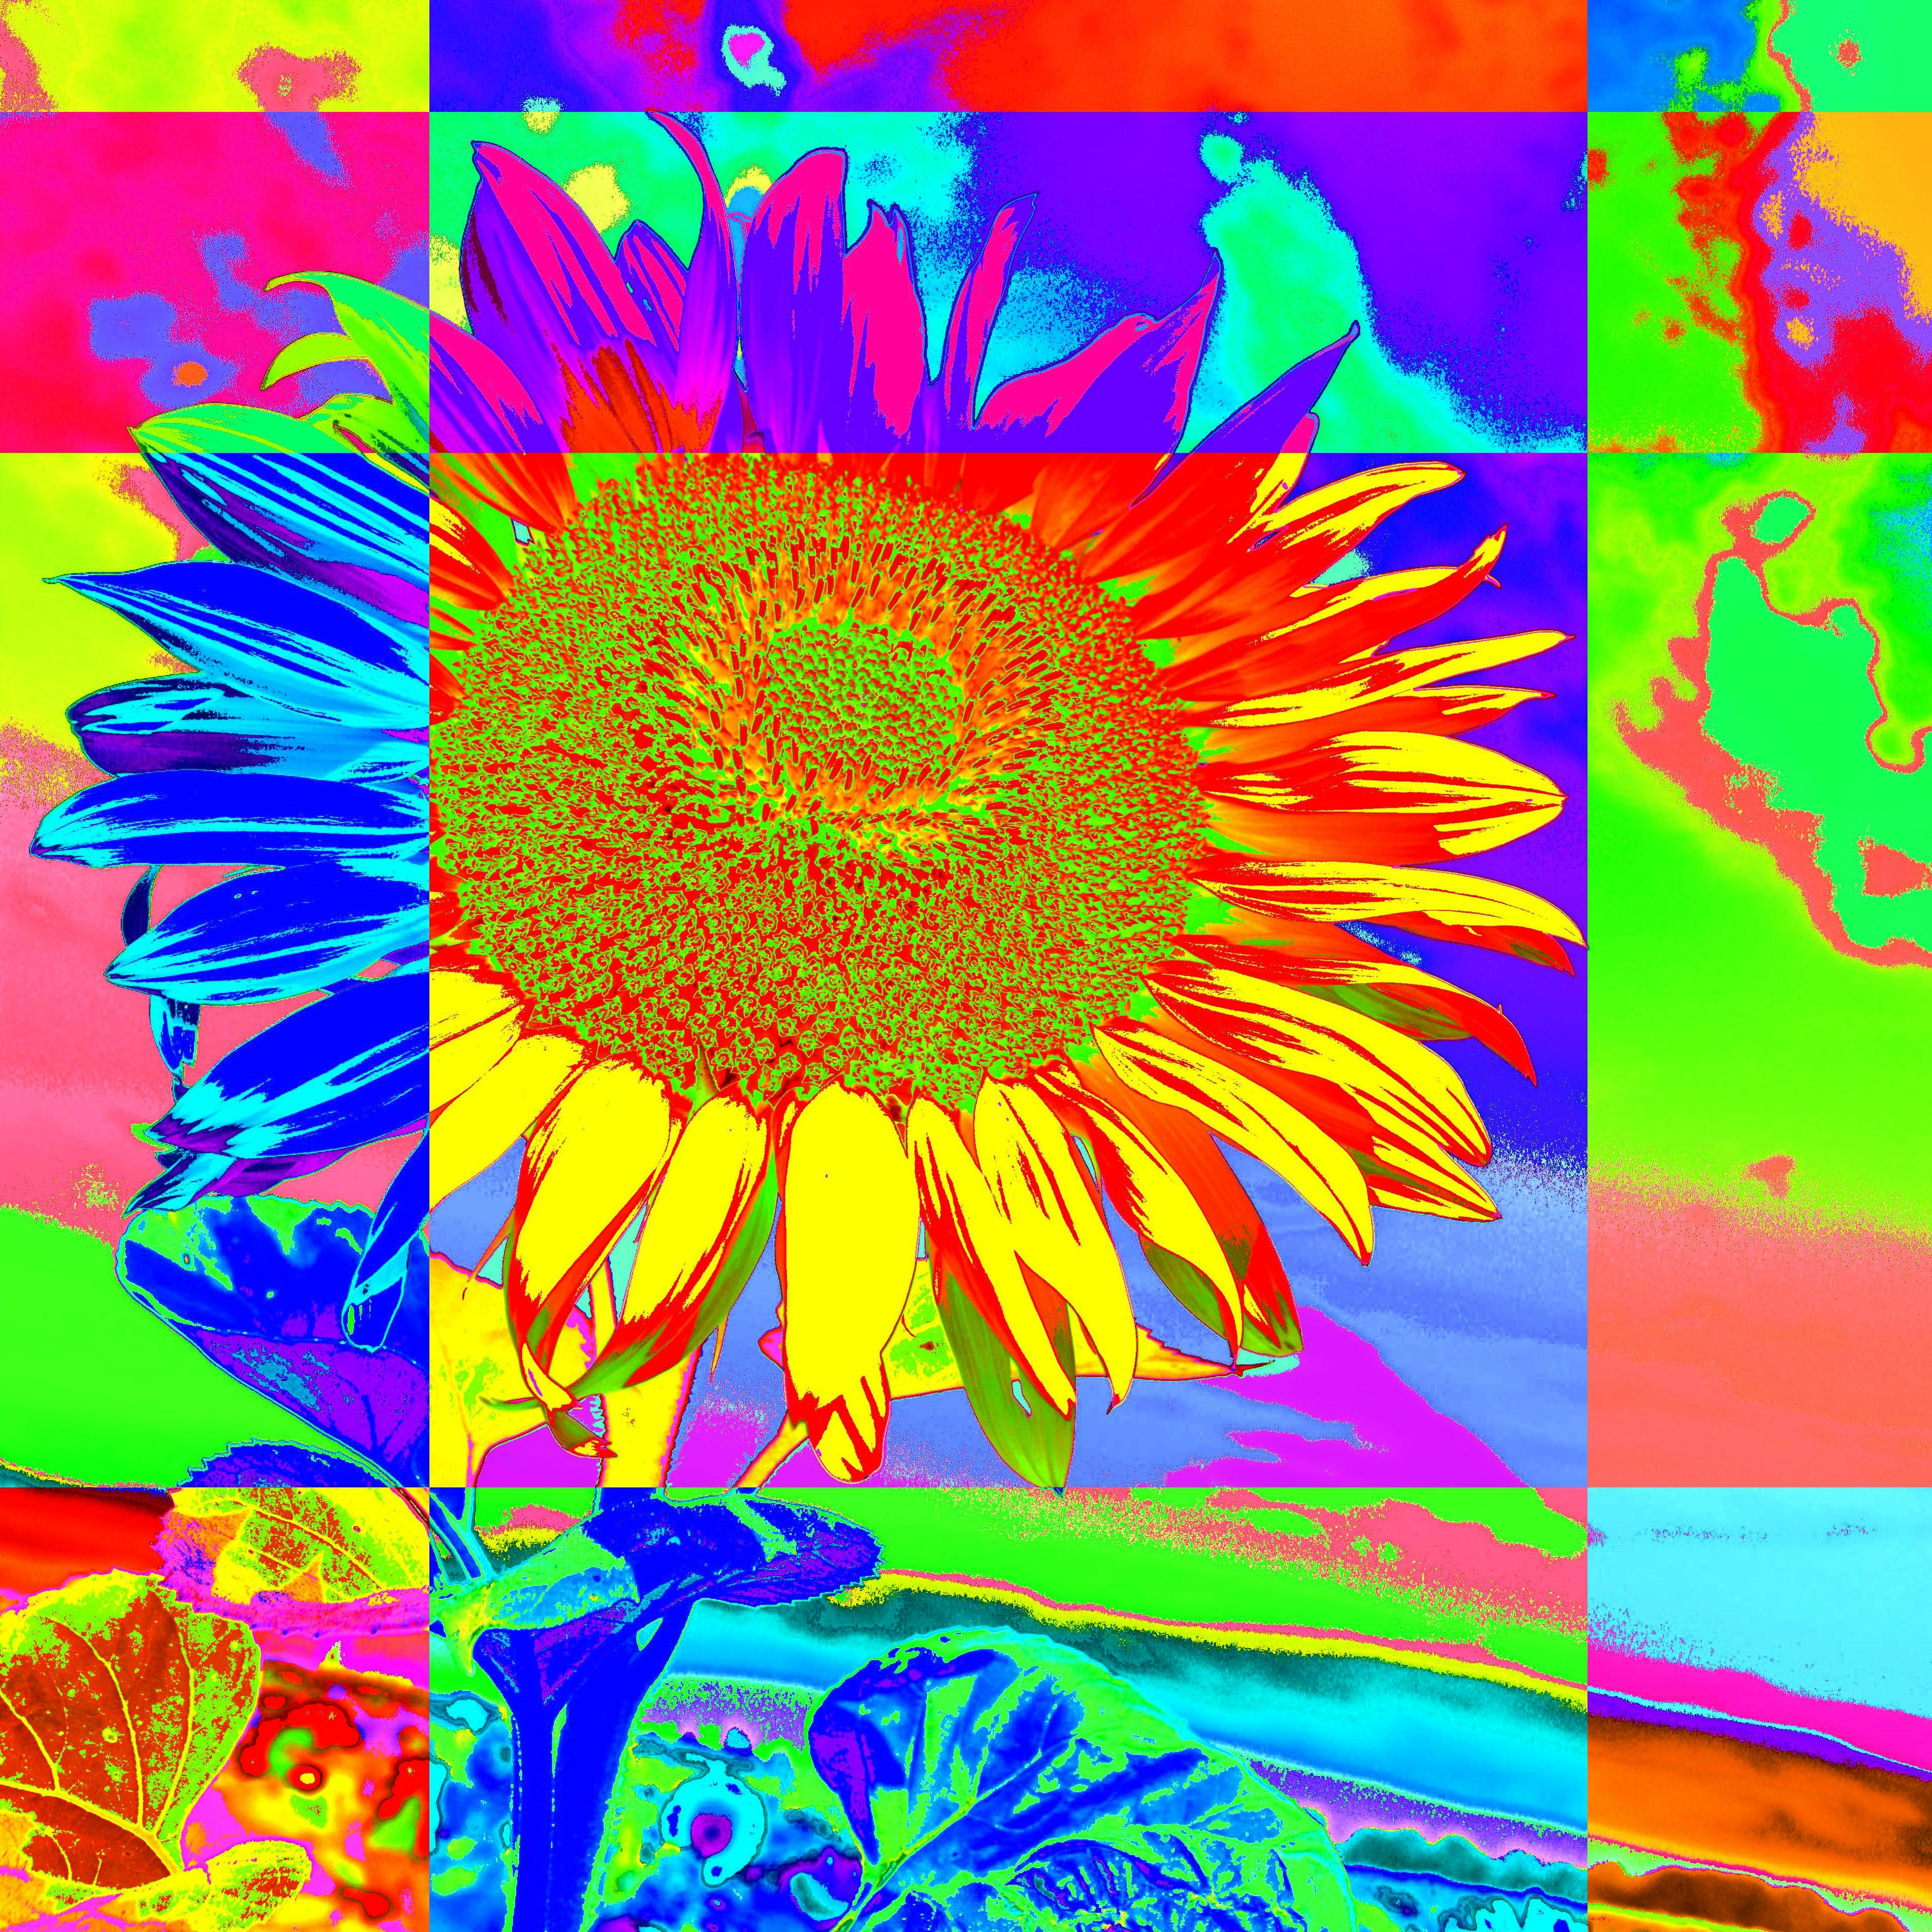 Merry sunflower/ Veselá slnečnica